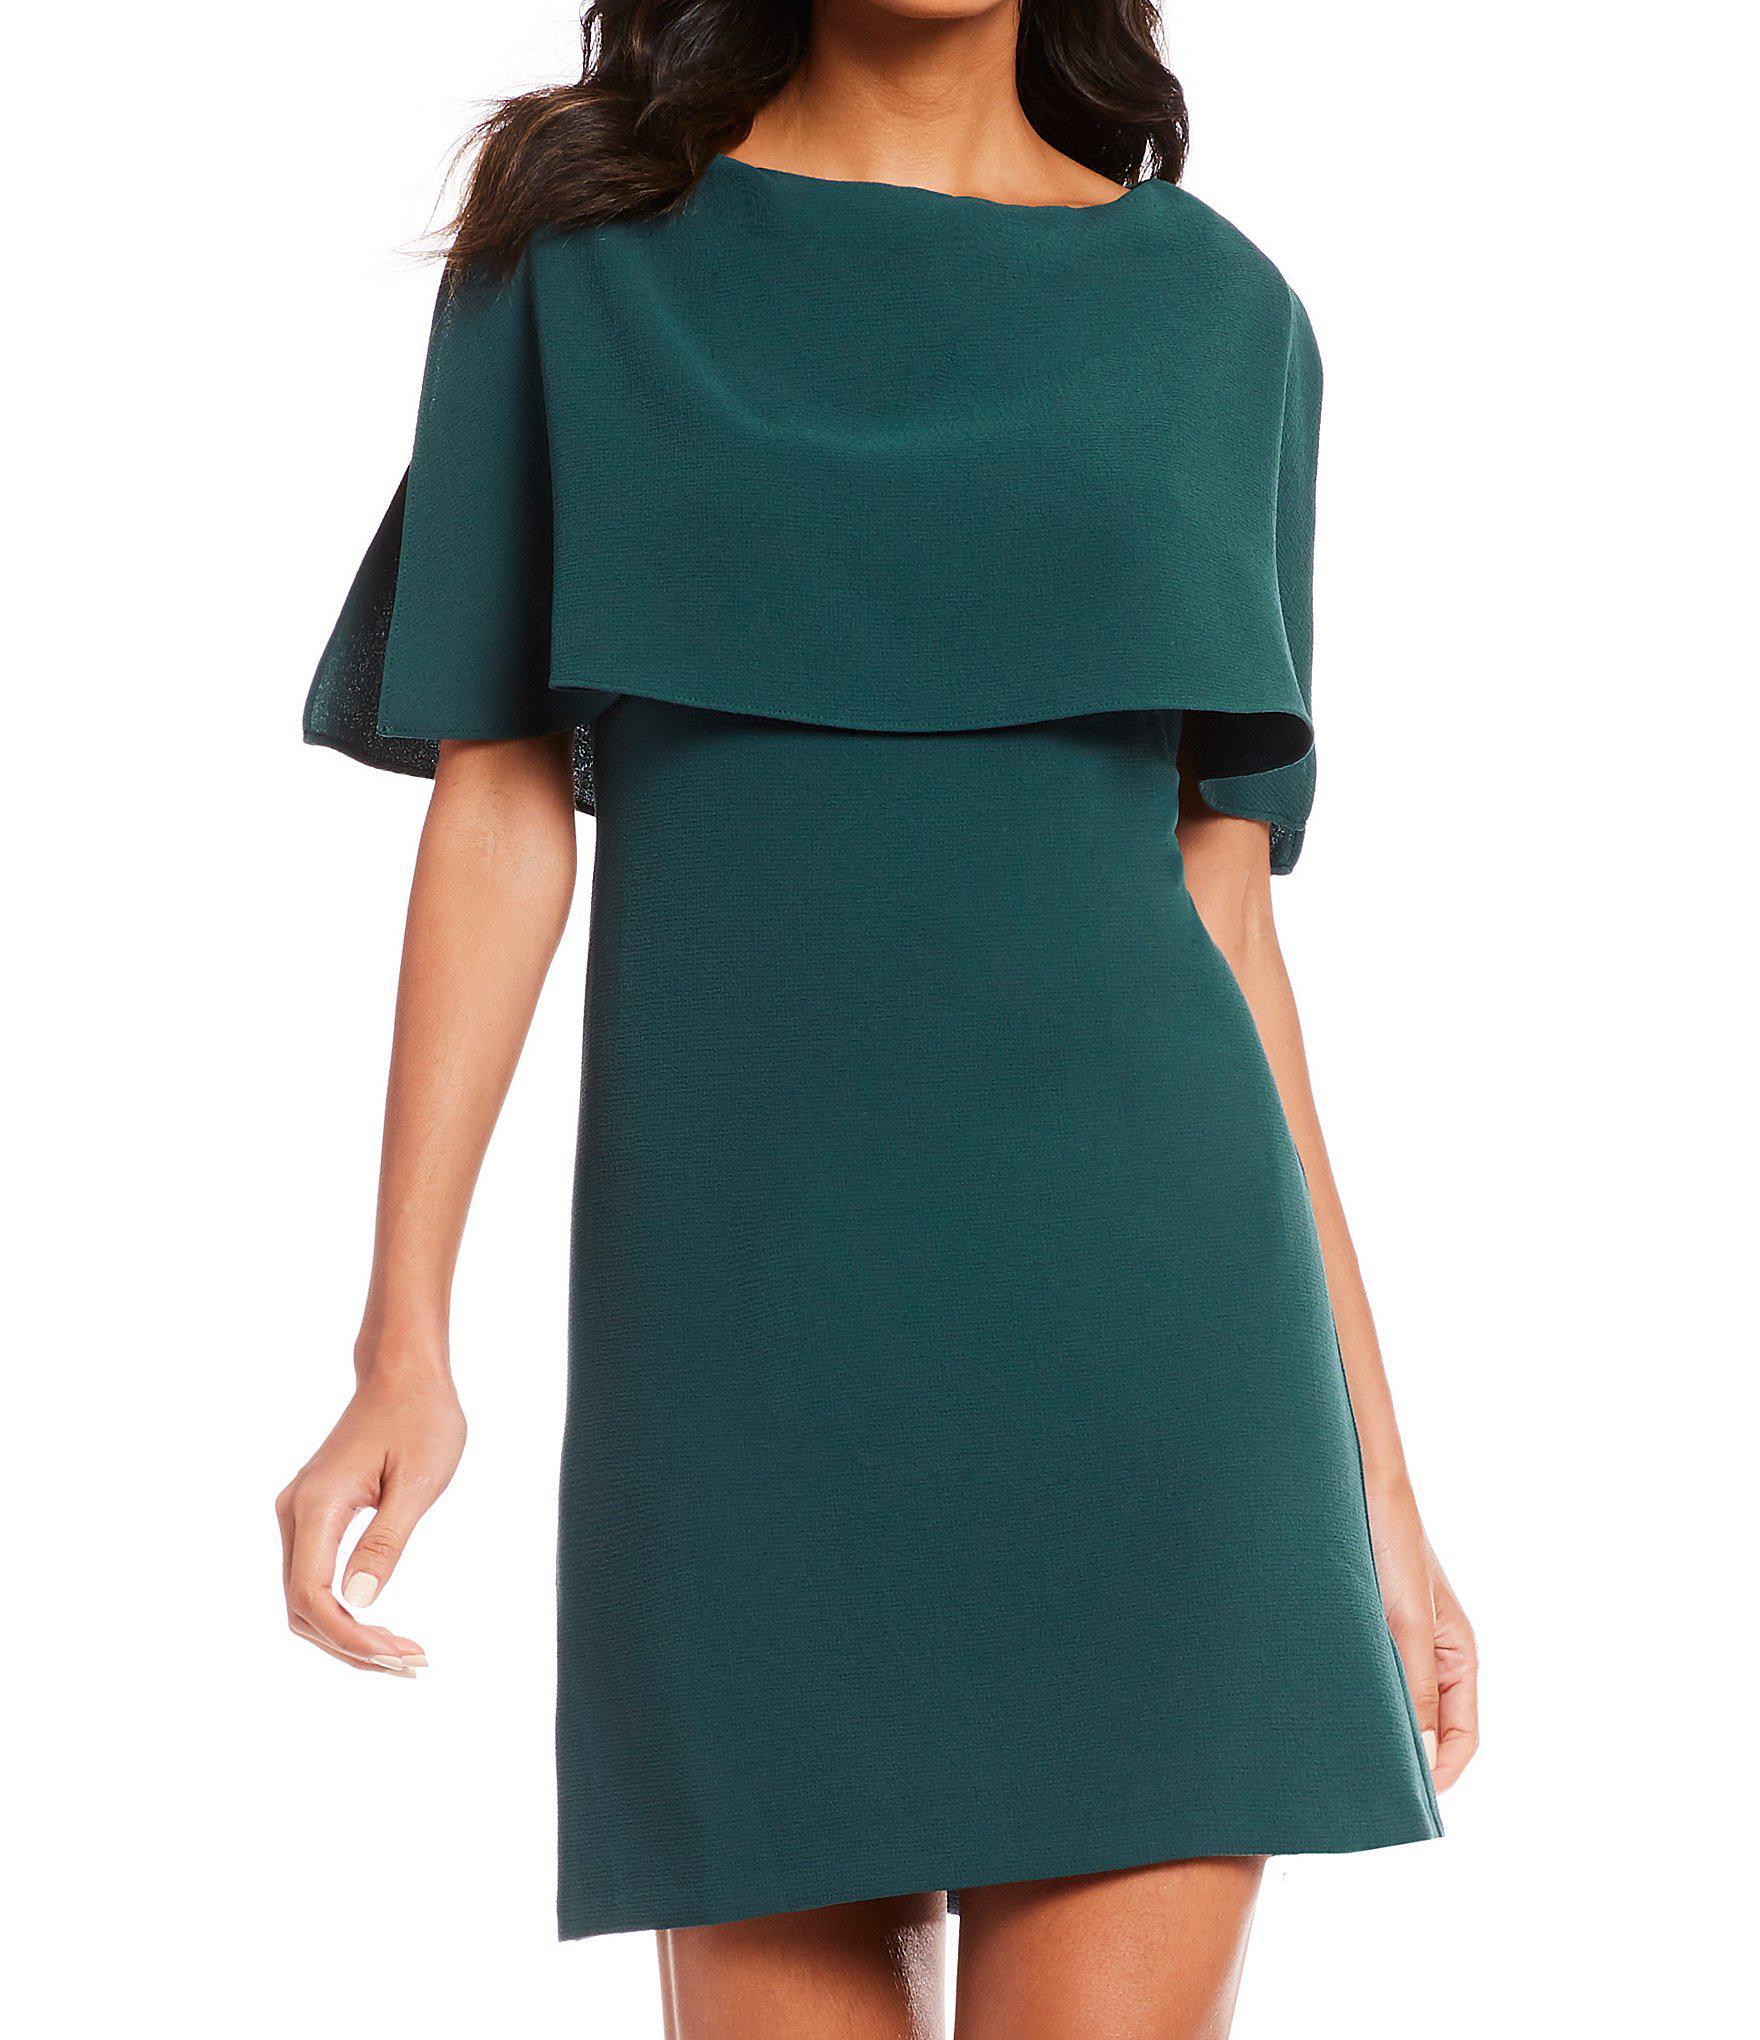 dc26c0cdc3e9 Adrianna Papell - Blue Split Sleeve Popover Dress - Lyst. View fullscreen